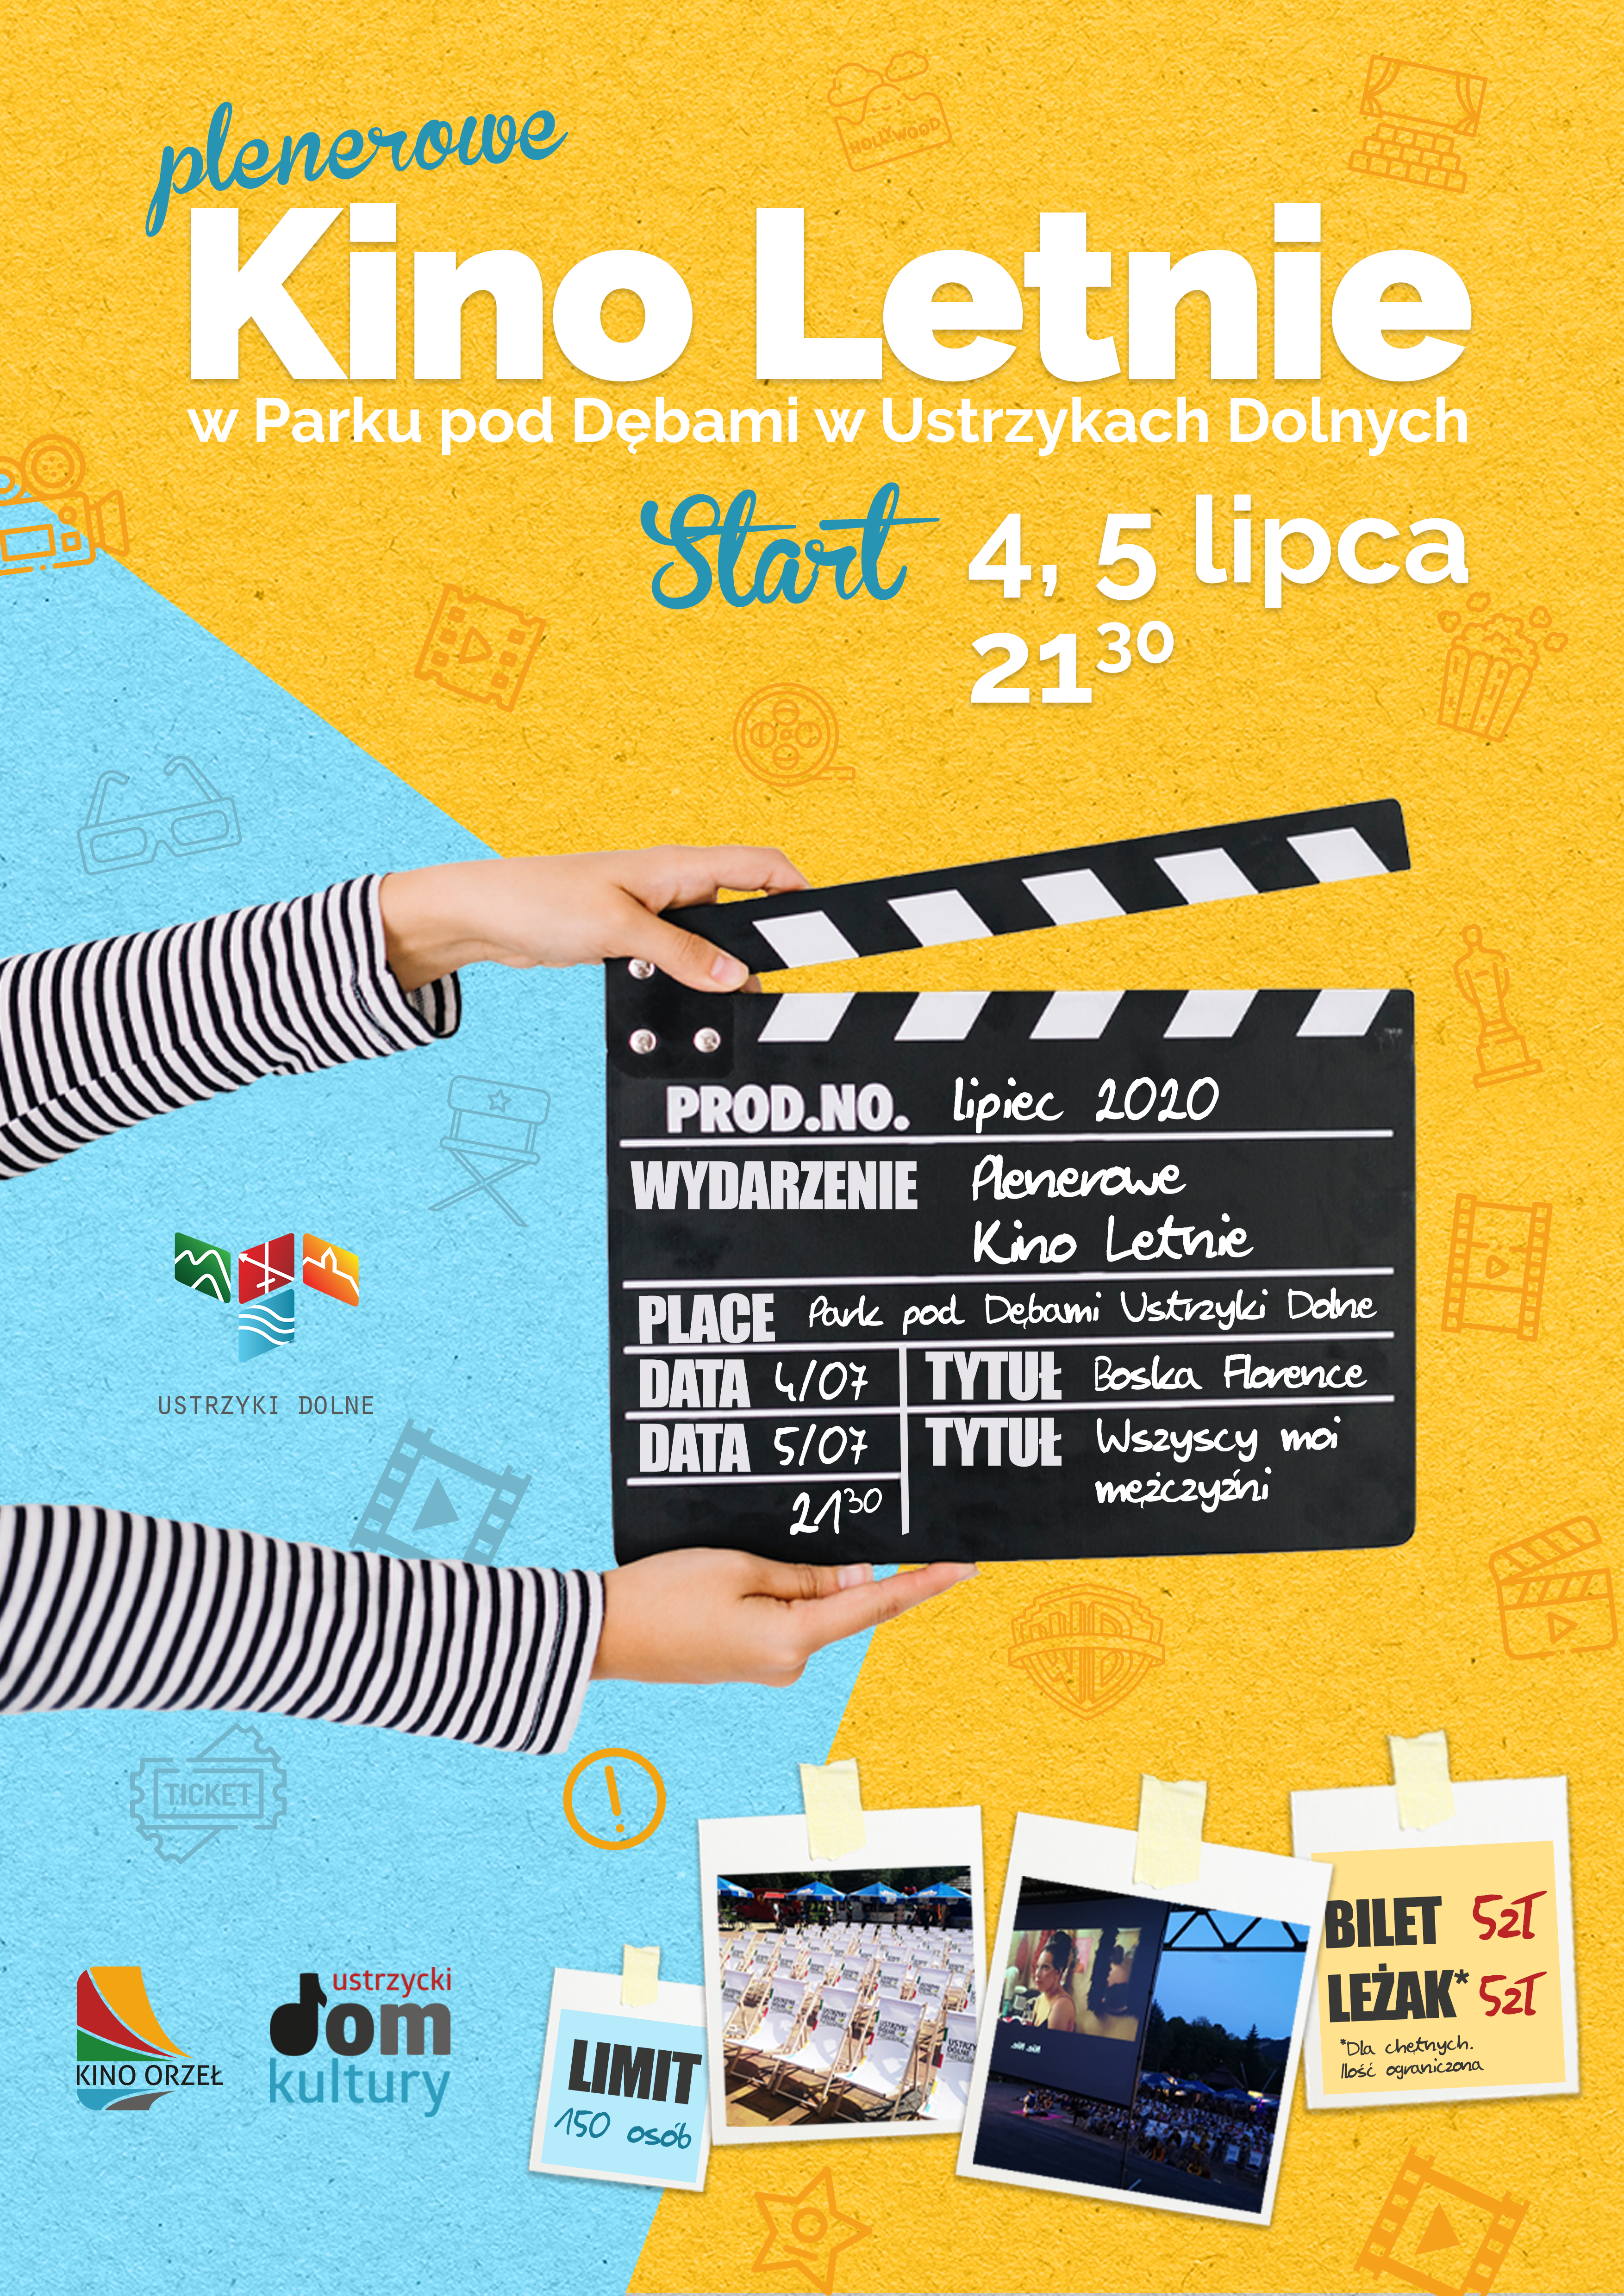 Plenerowe Kino Letnie - plakat